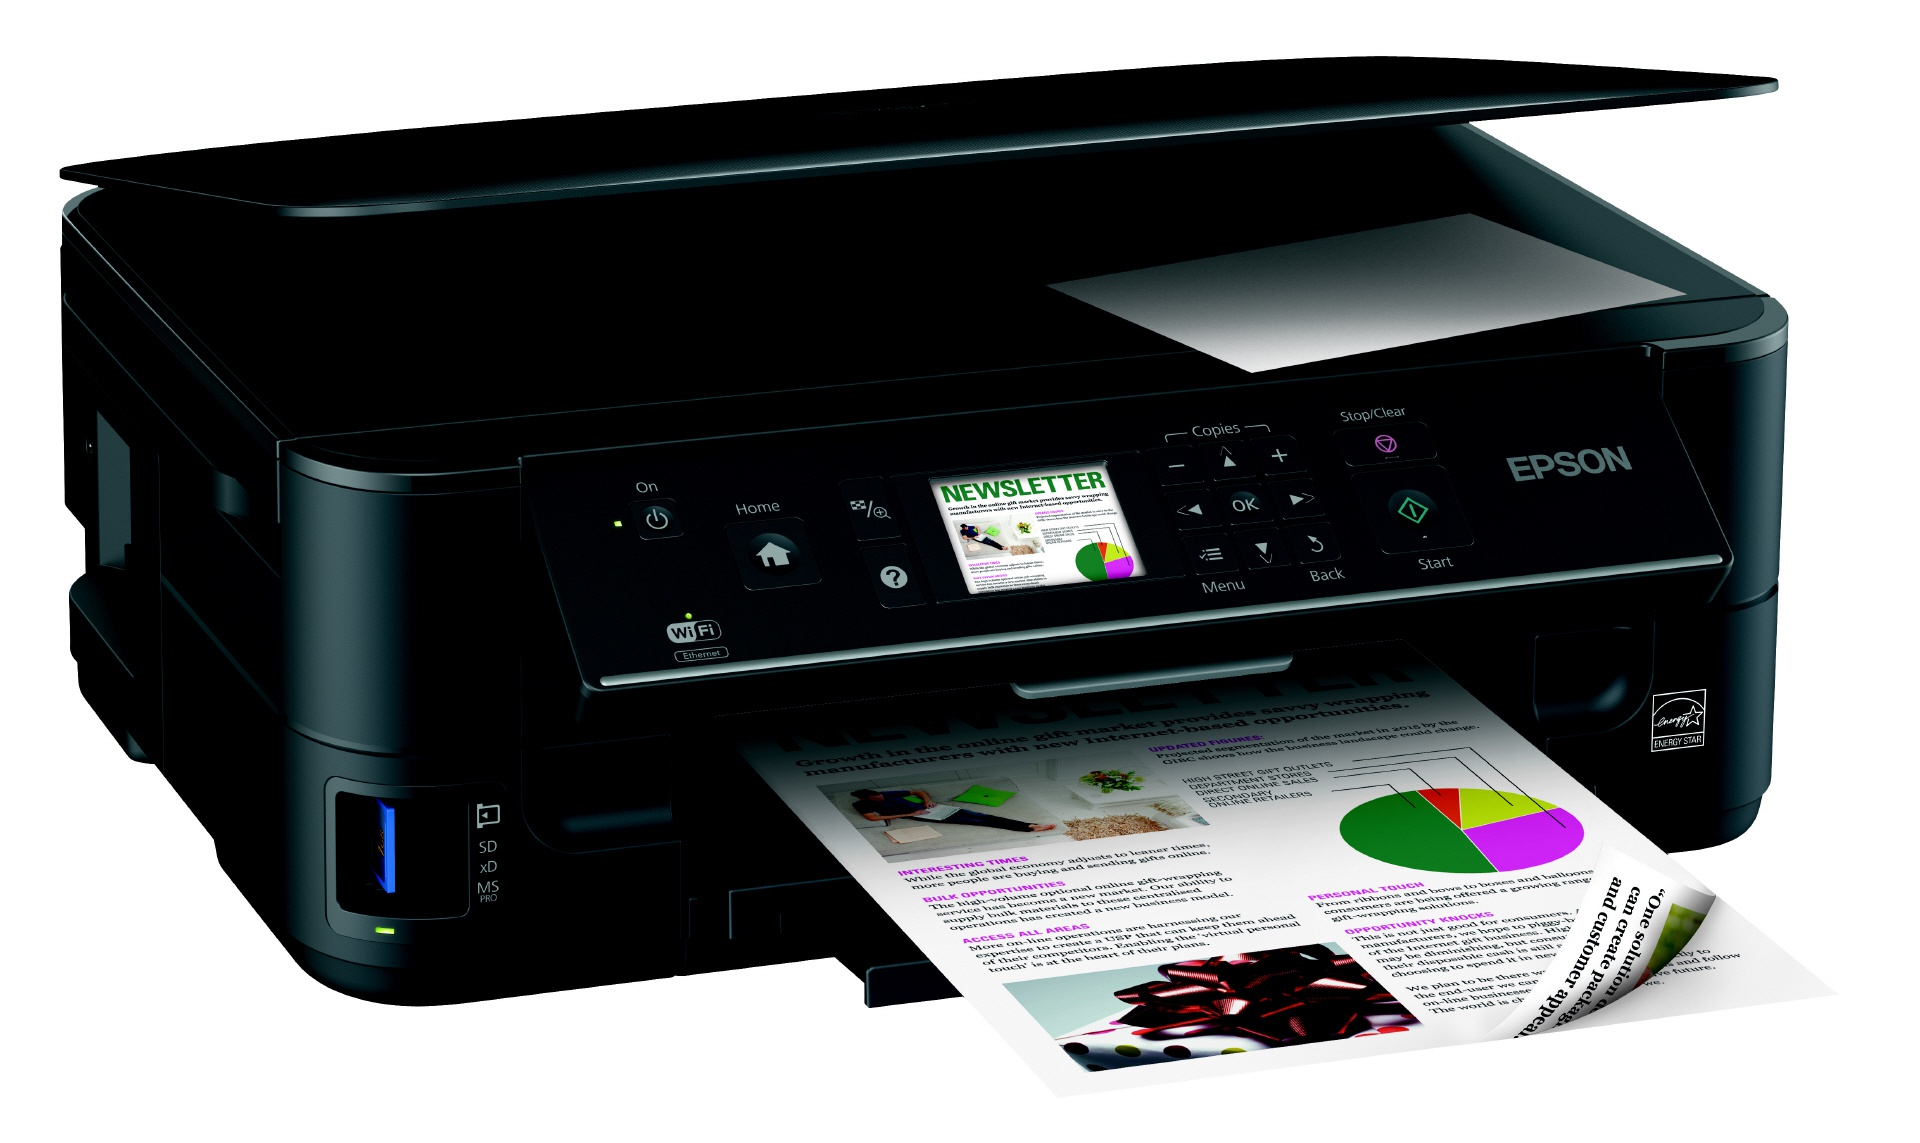 Epson 535 Printer Driver